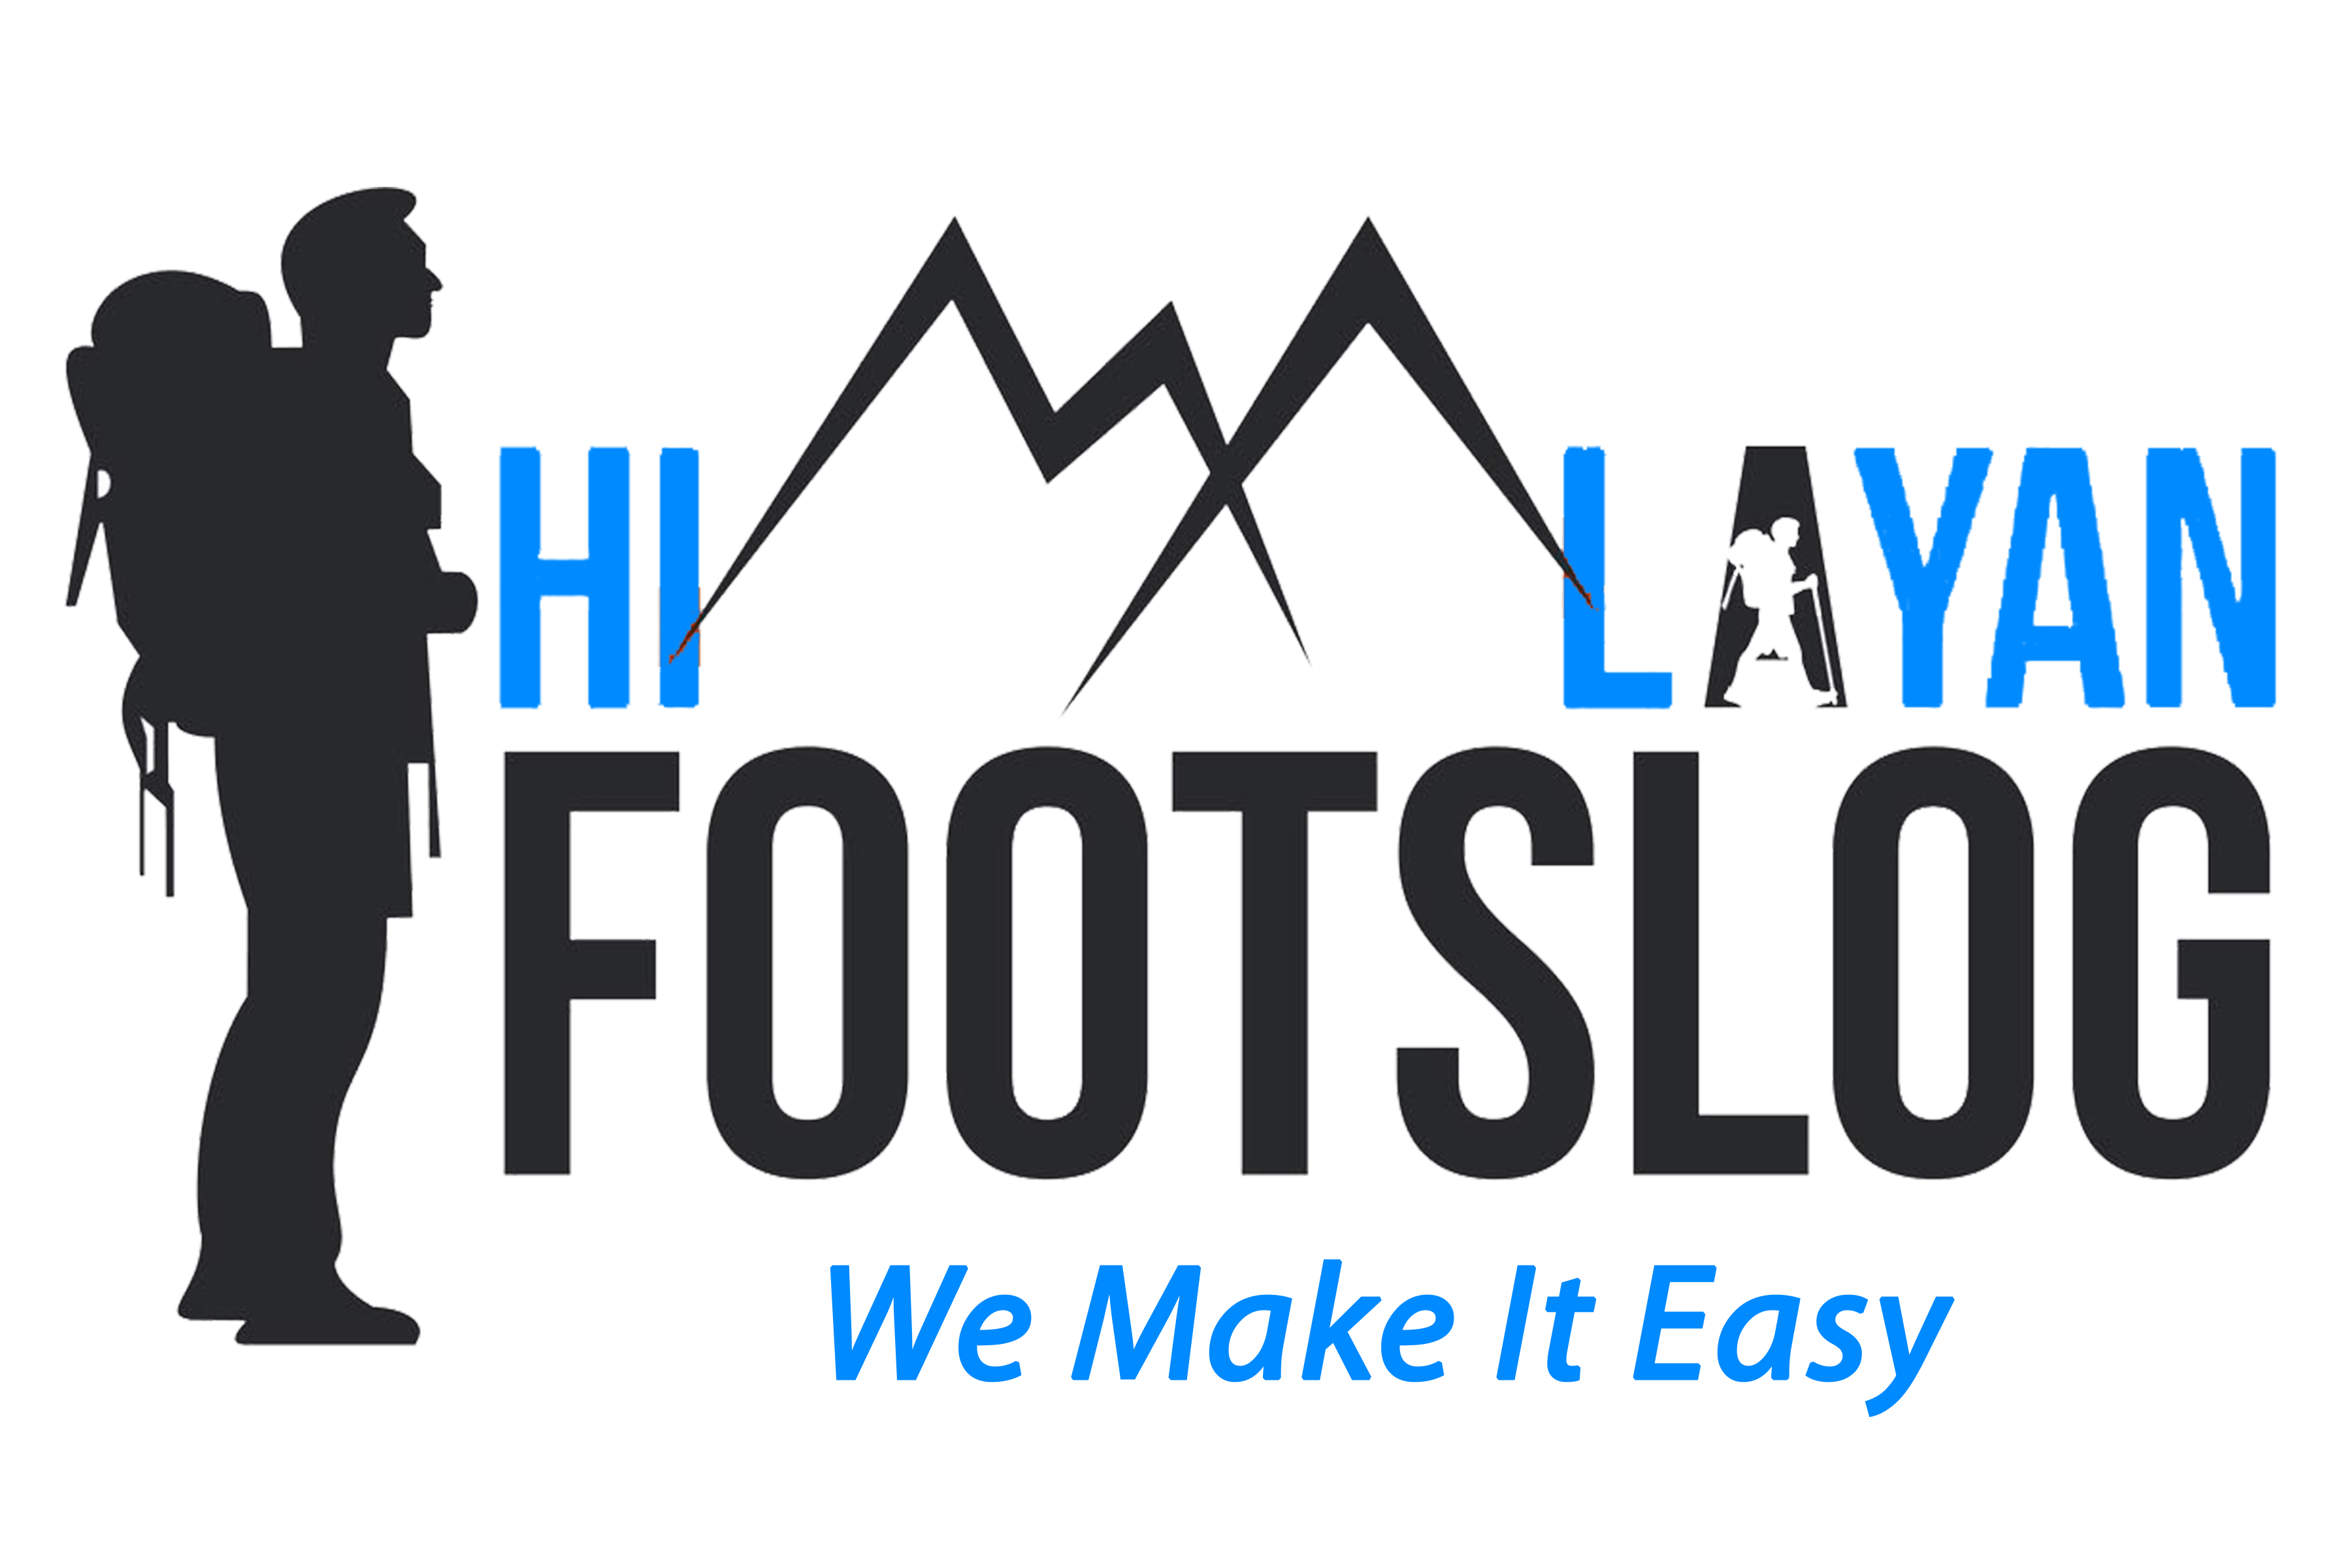 Himalayan Footslog